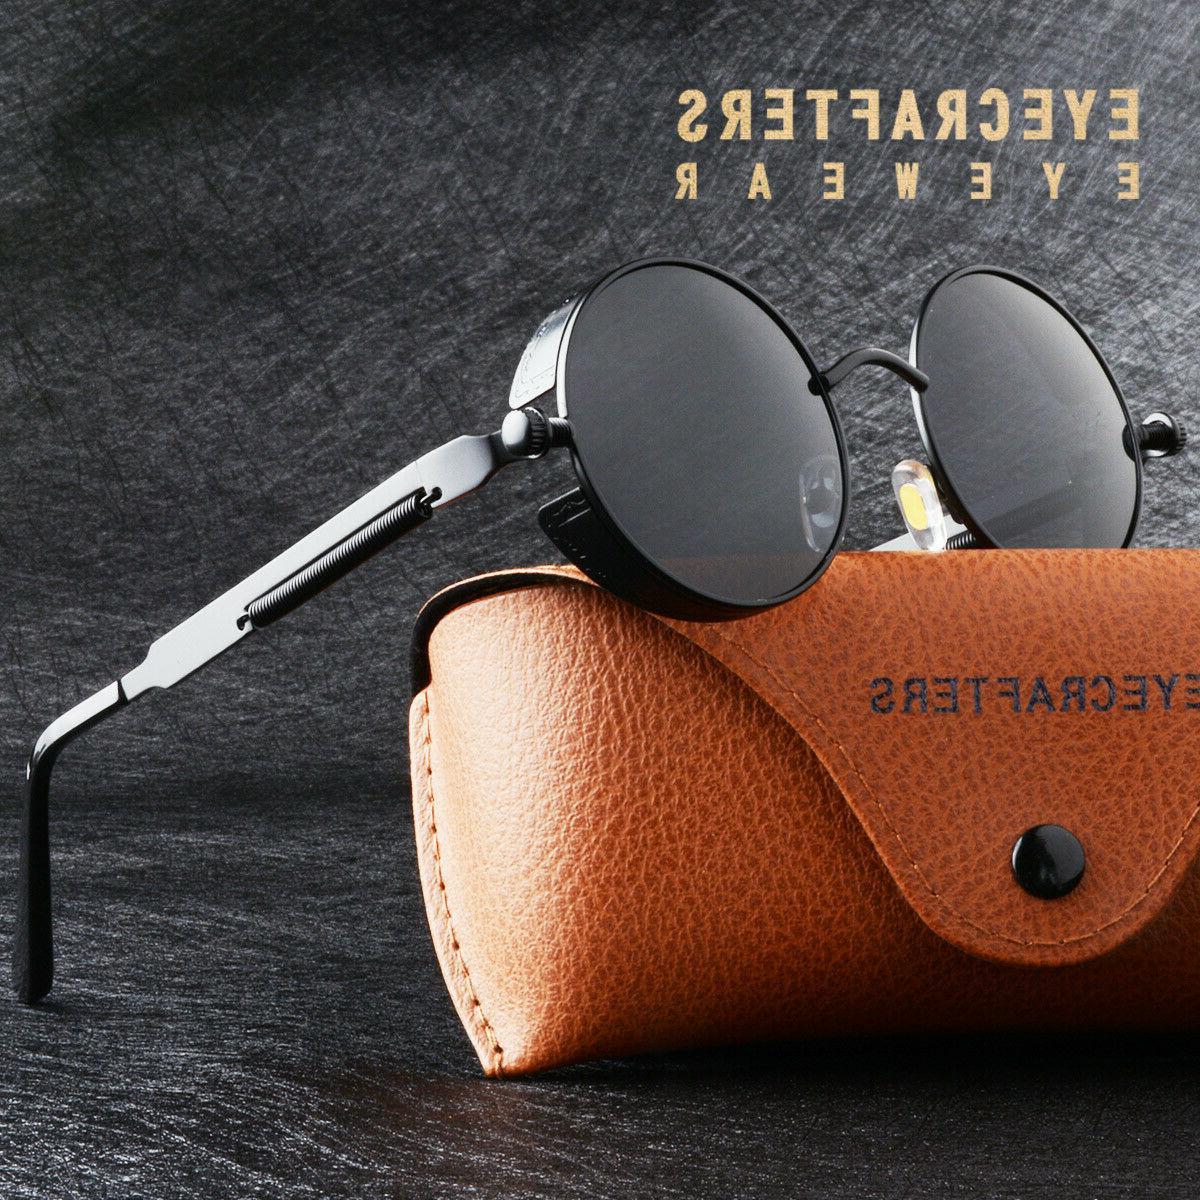 Gold Metal Retro Round Polarized Sunglasses Vintage Gothic S